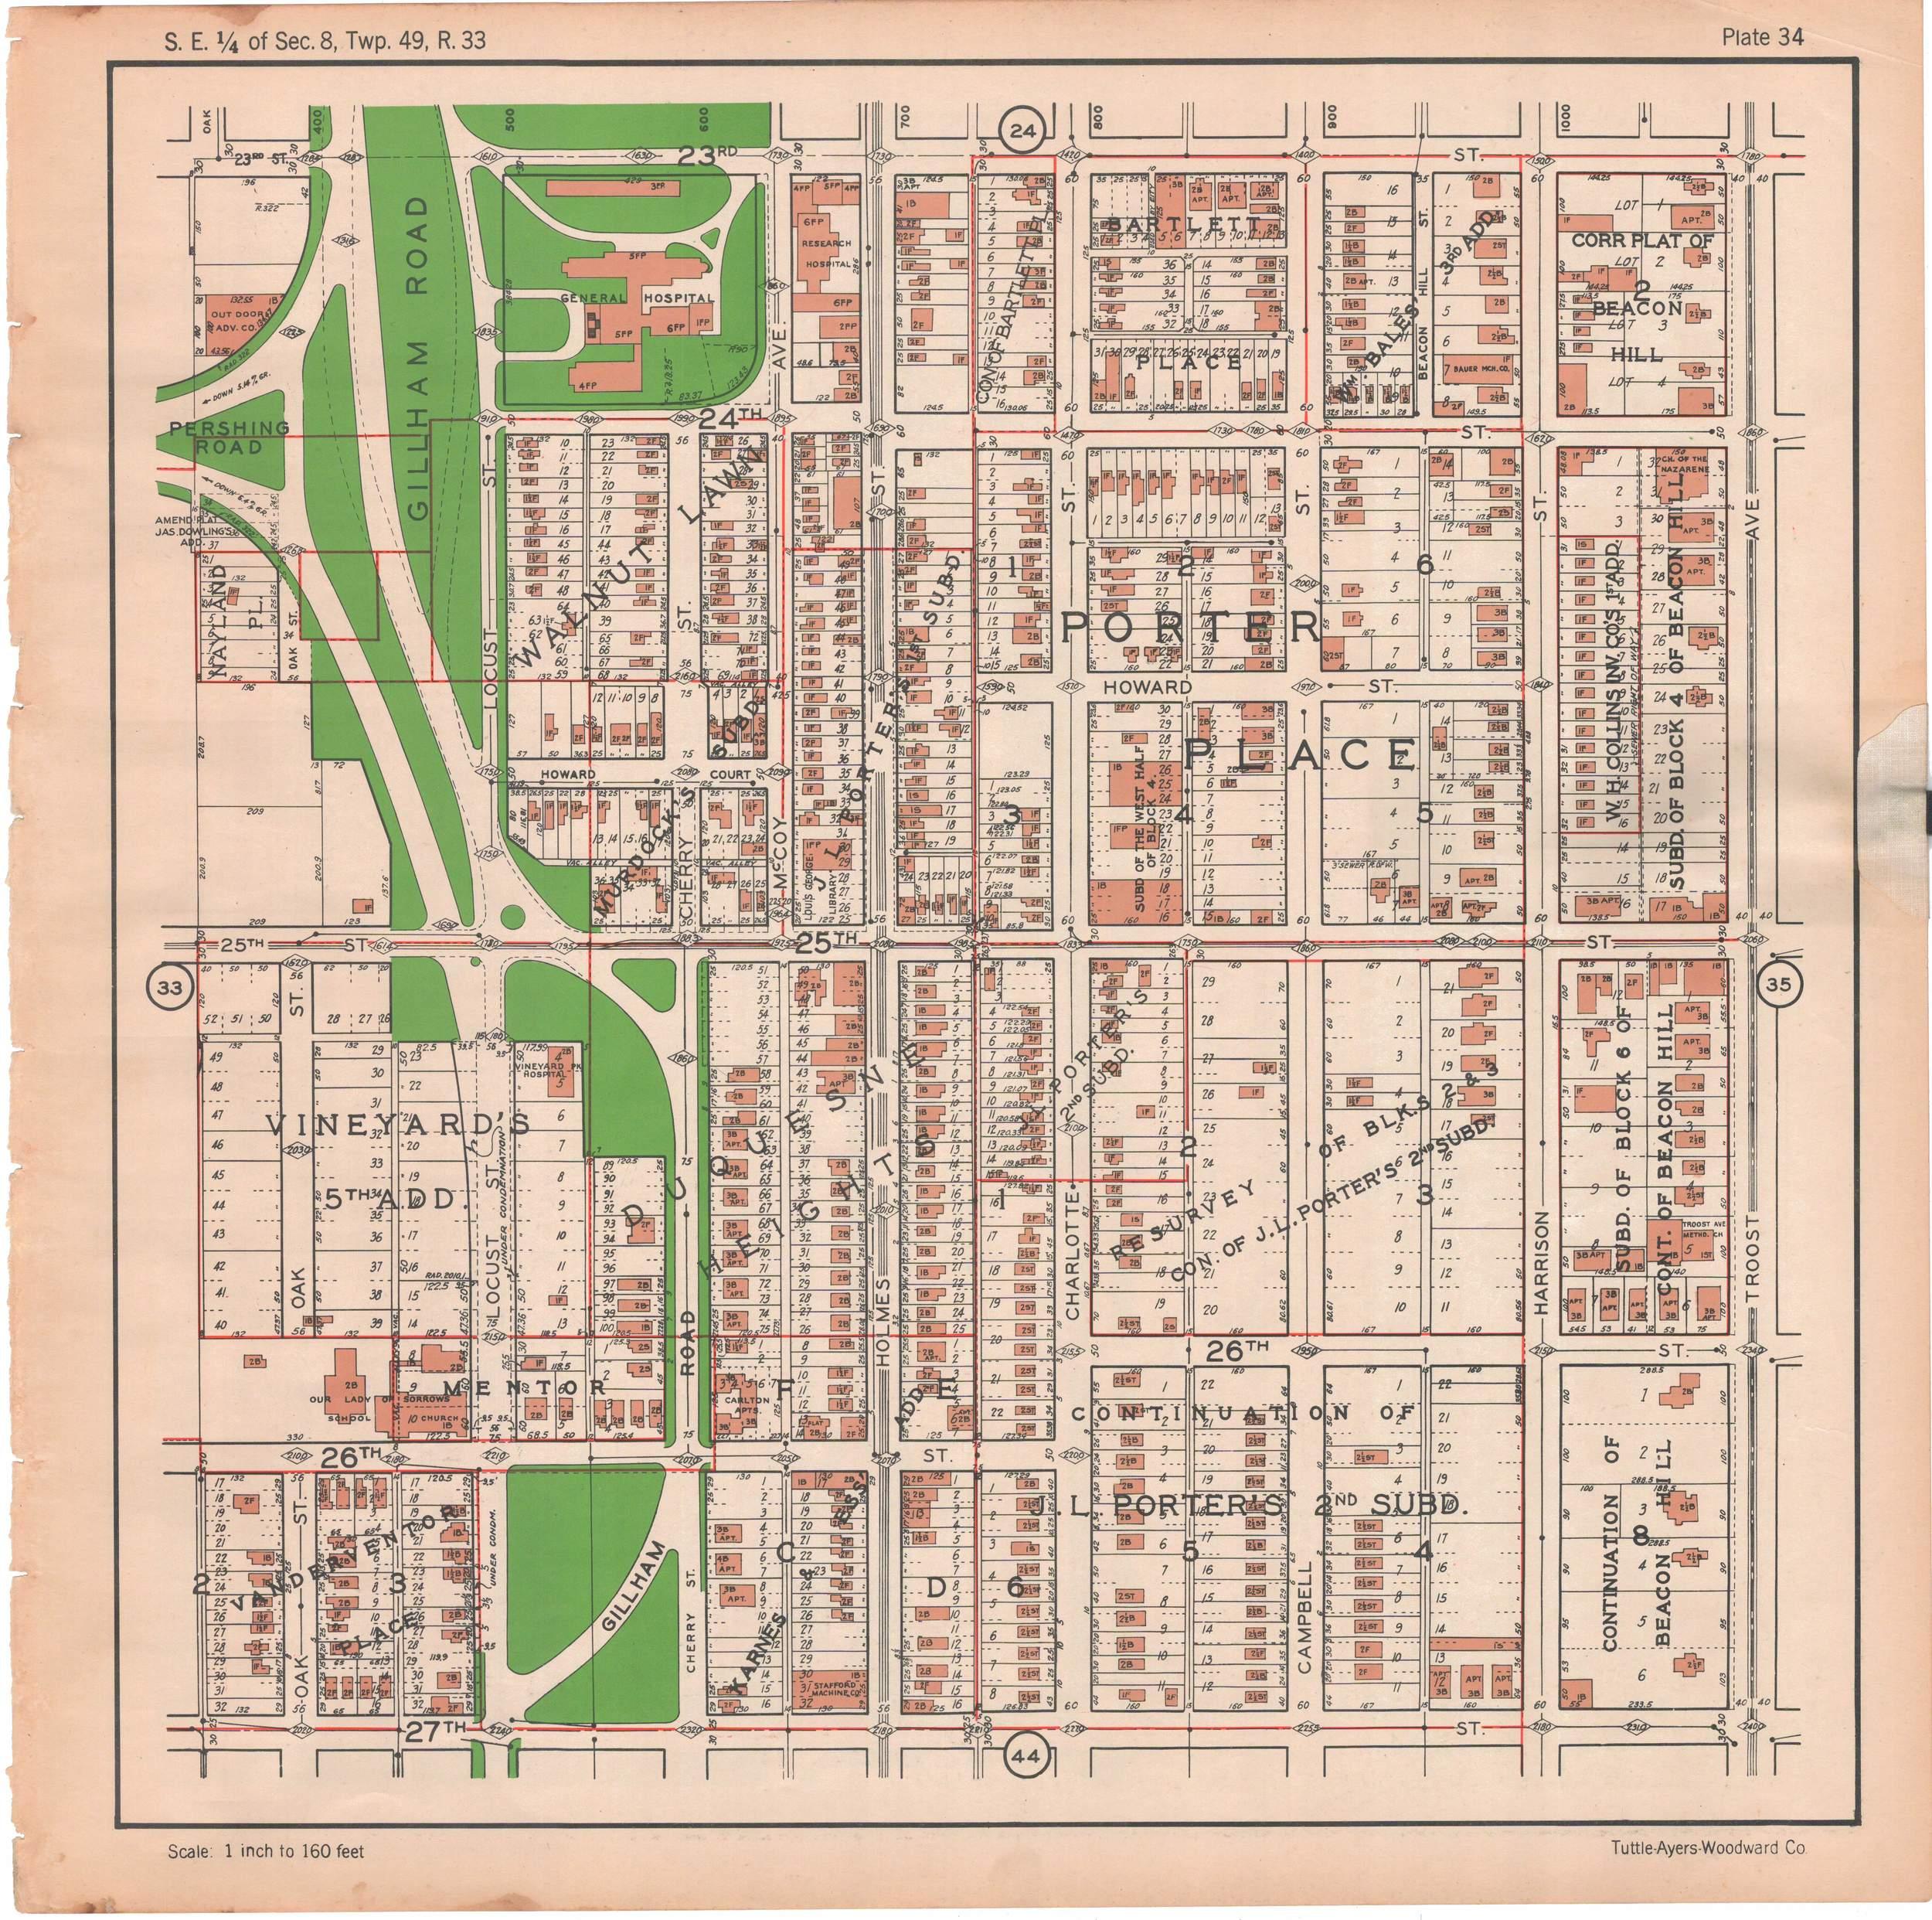 1925 TUTTLE_AYERS_Plate 34.JPG